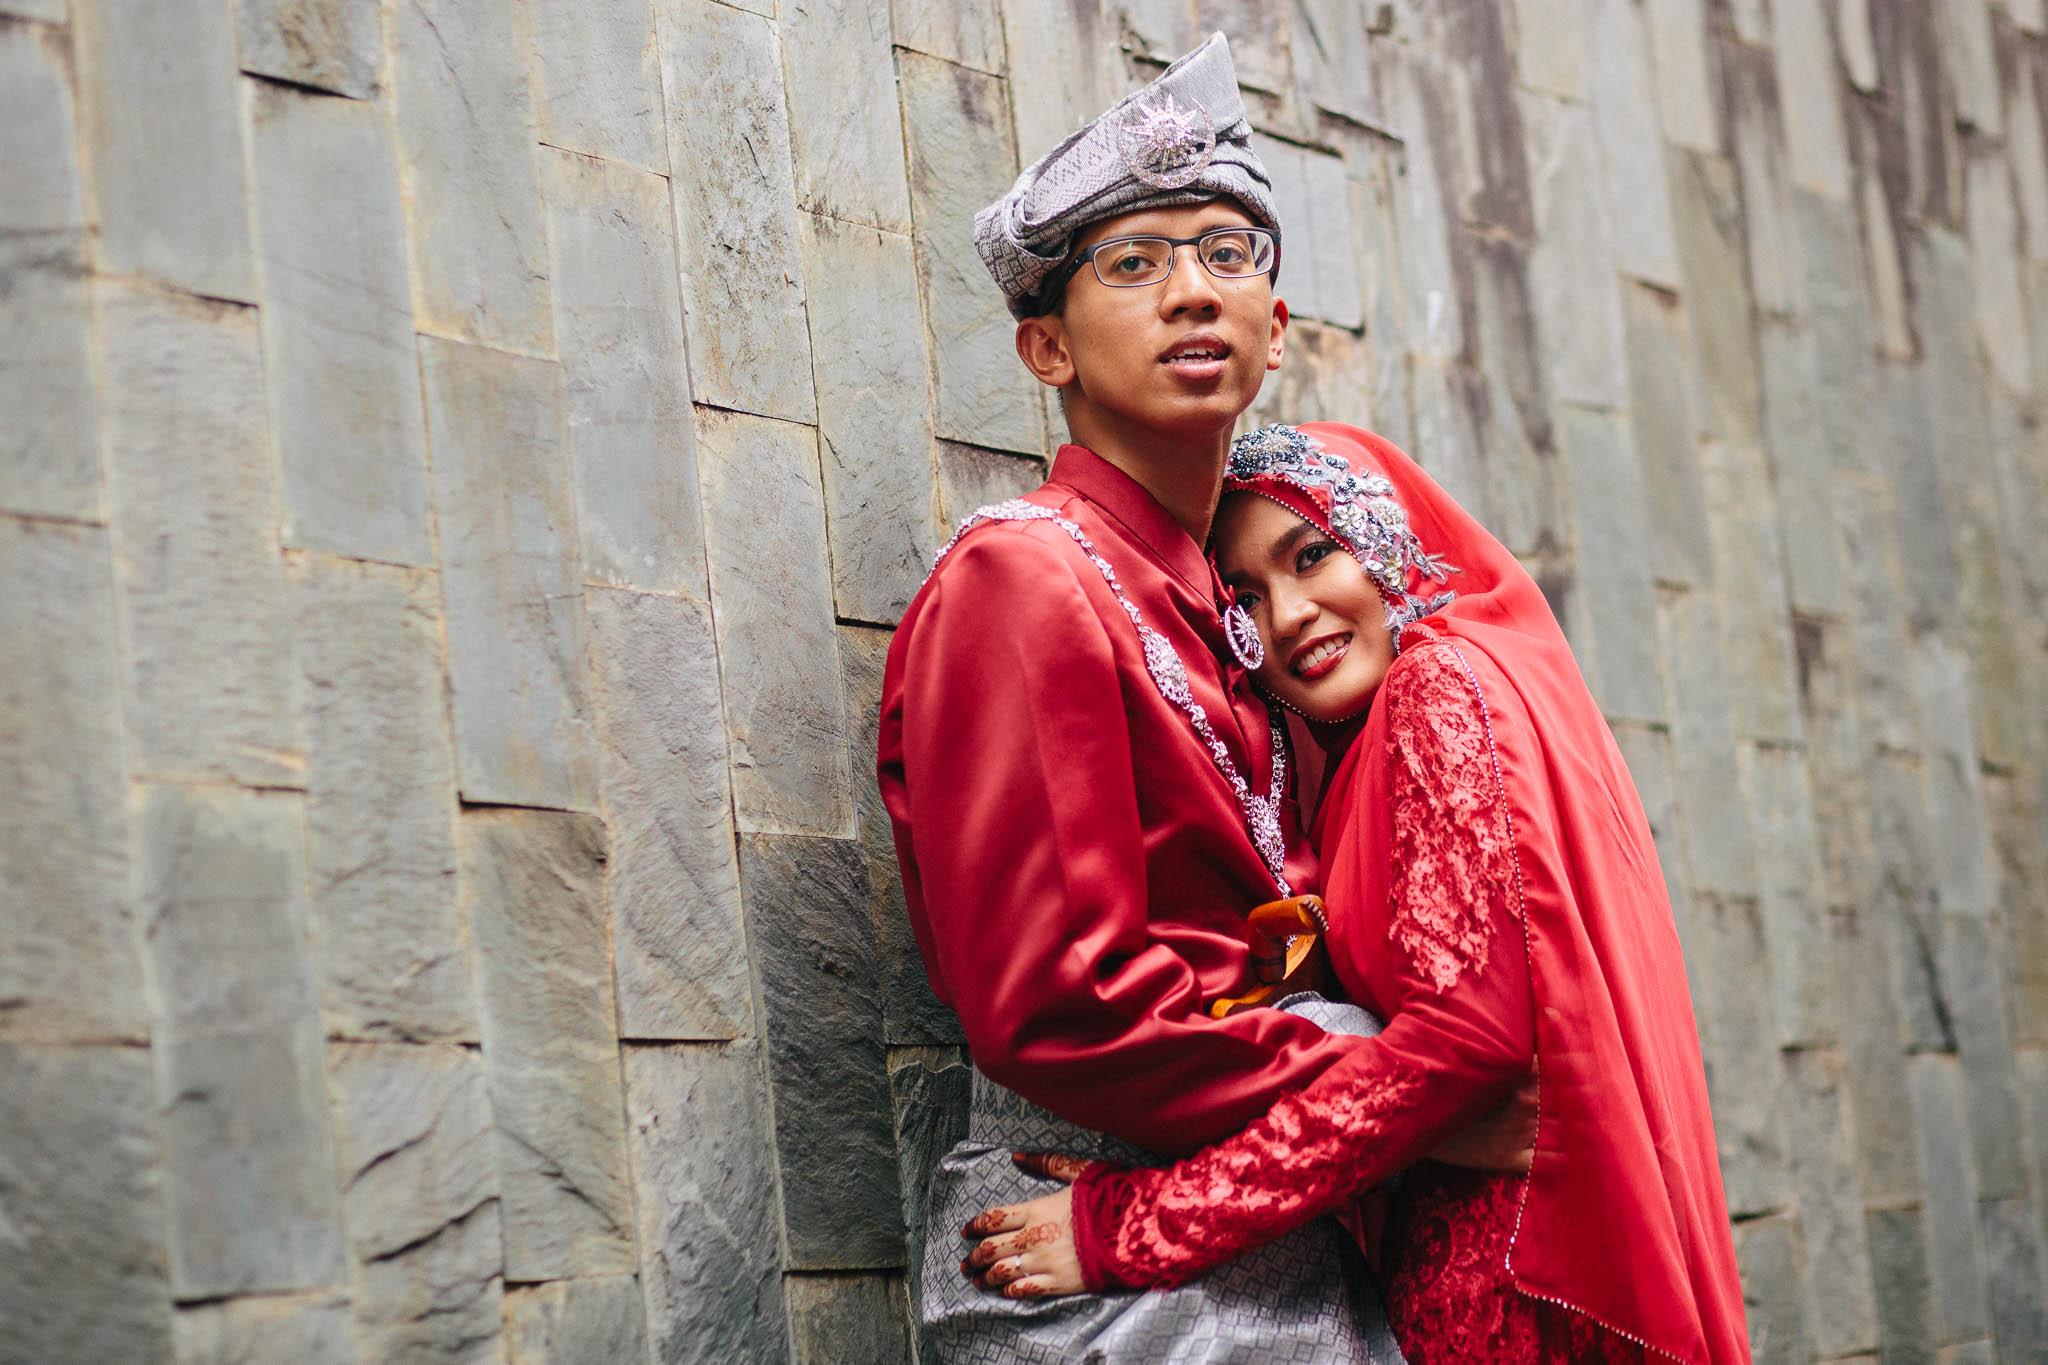 singapore-wedding-photographer-sharalyn-syazwan-076.jpg